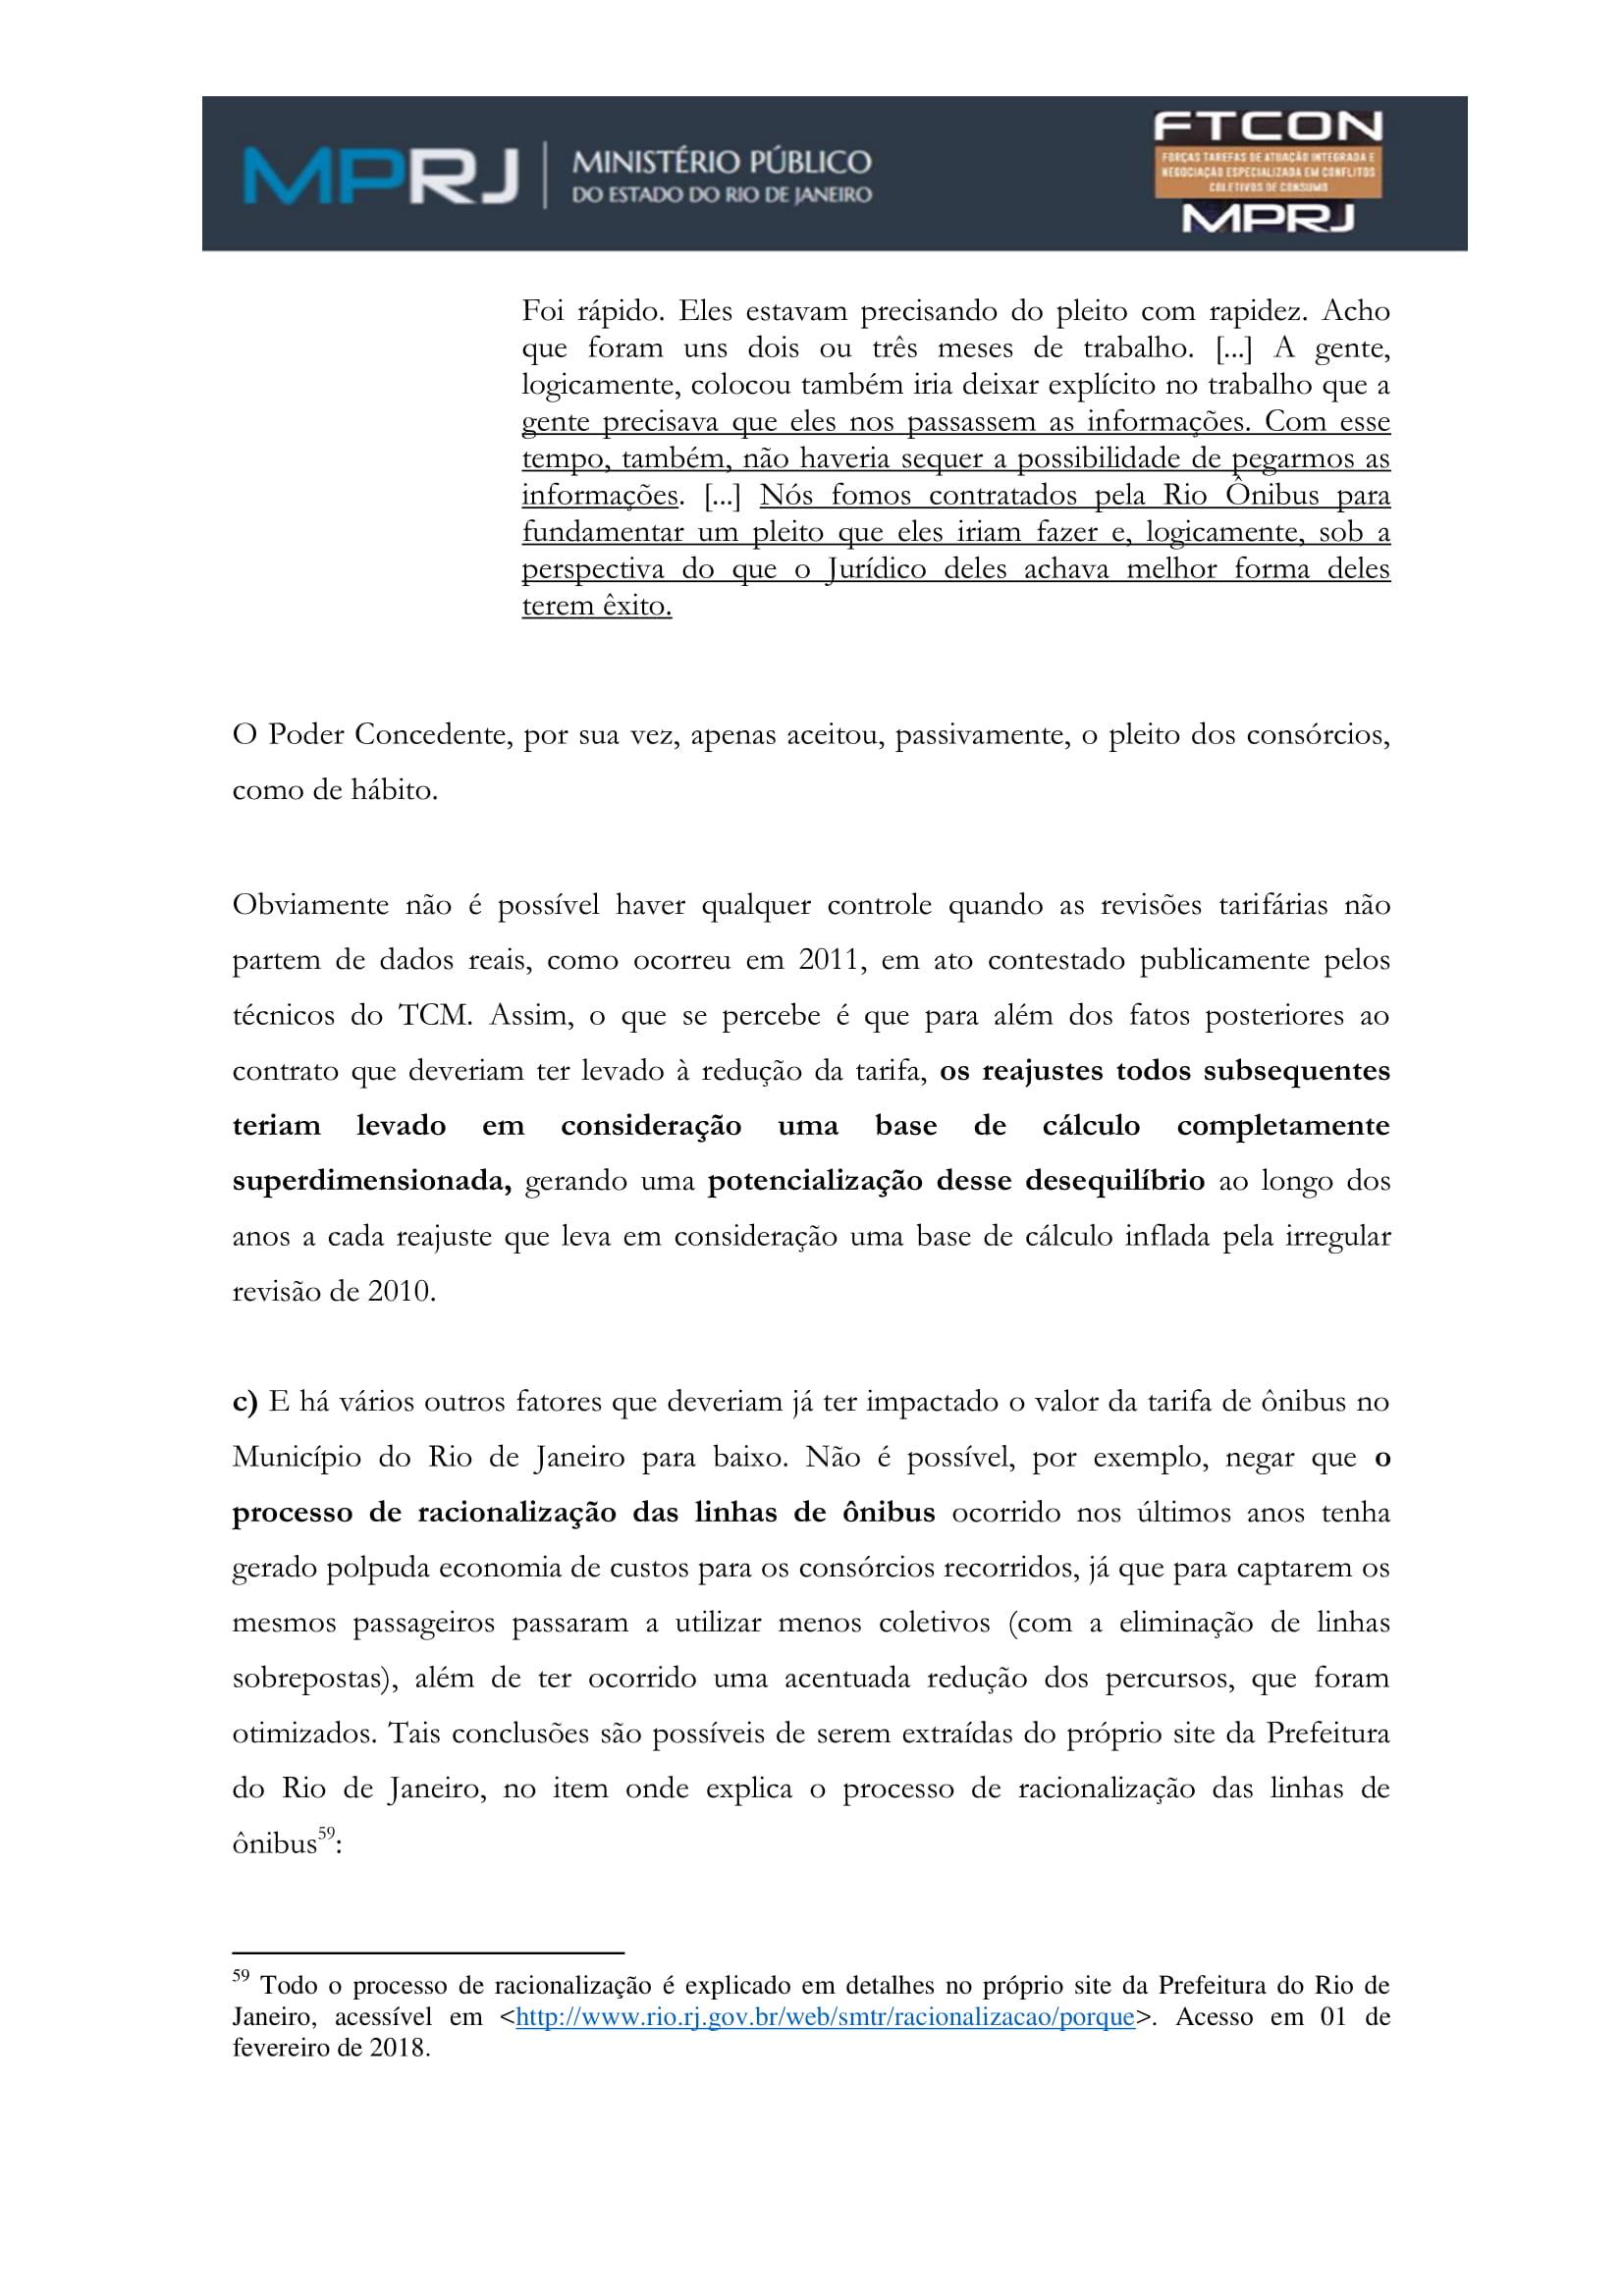 acp_caducidade_onibus_dr_rt-073